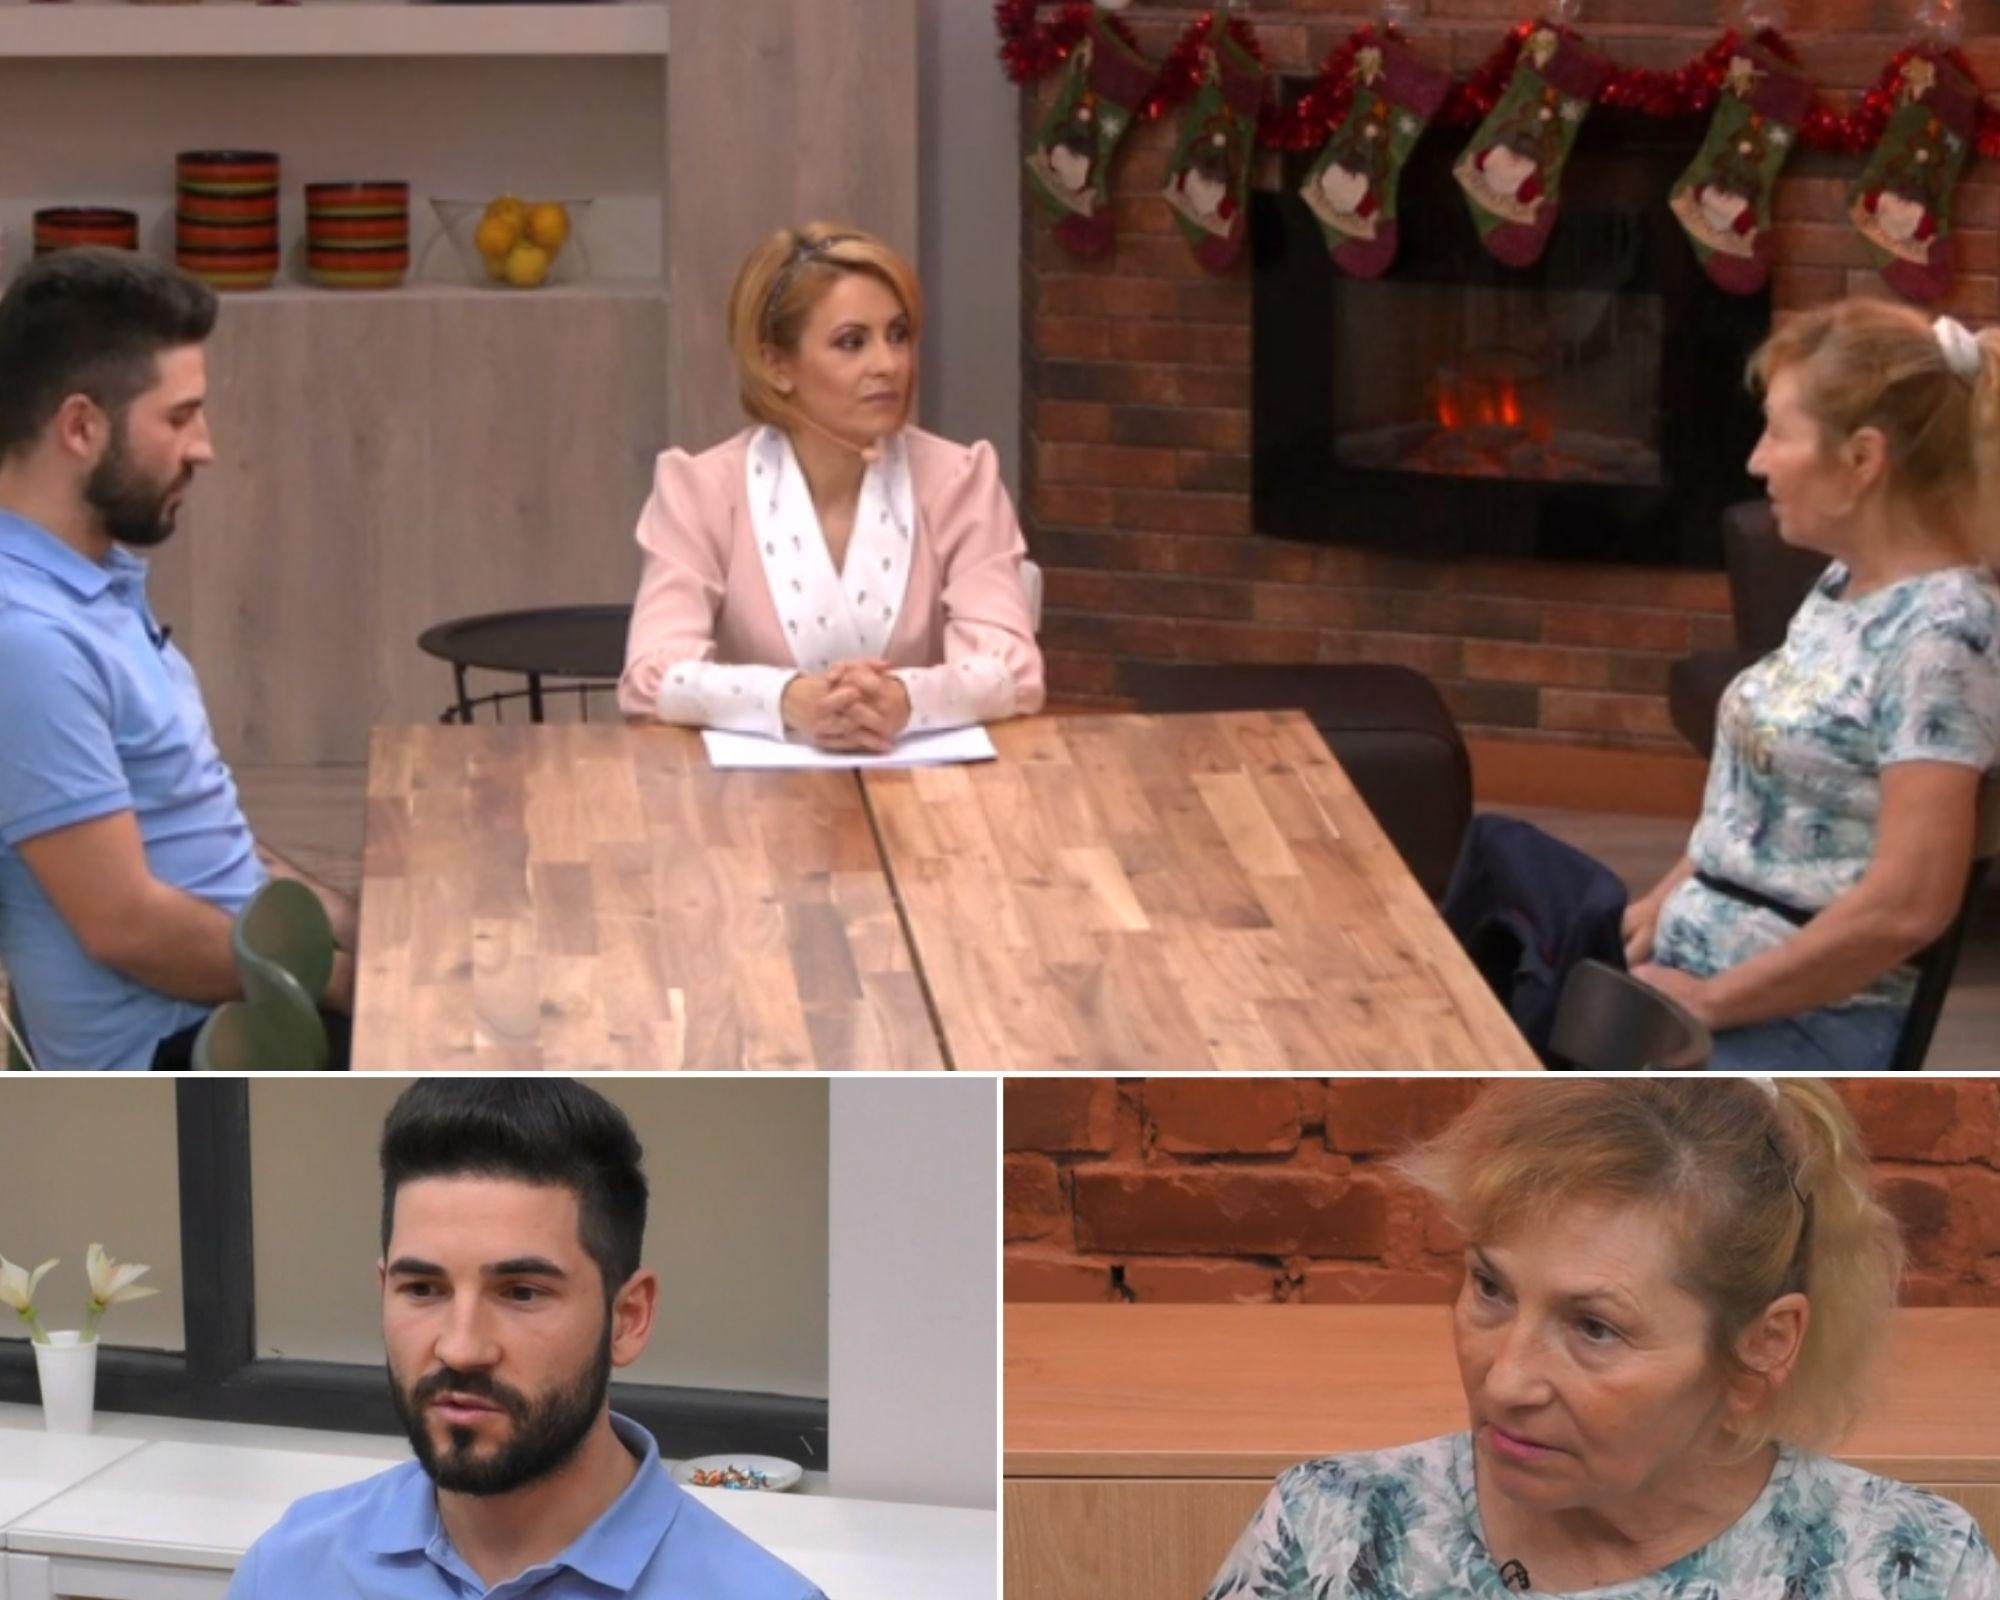 David, Mia si Simona Gherghe, in timpul emisiei live, cand s-au retras in bucatarie sa discute despre comportamentul femeii